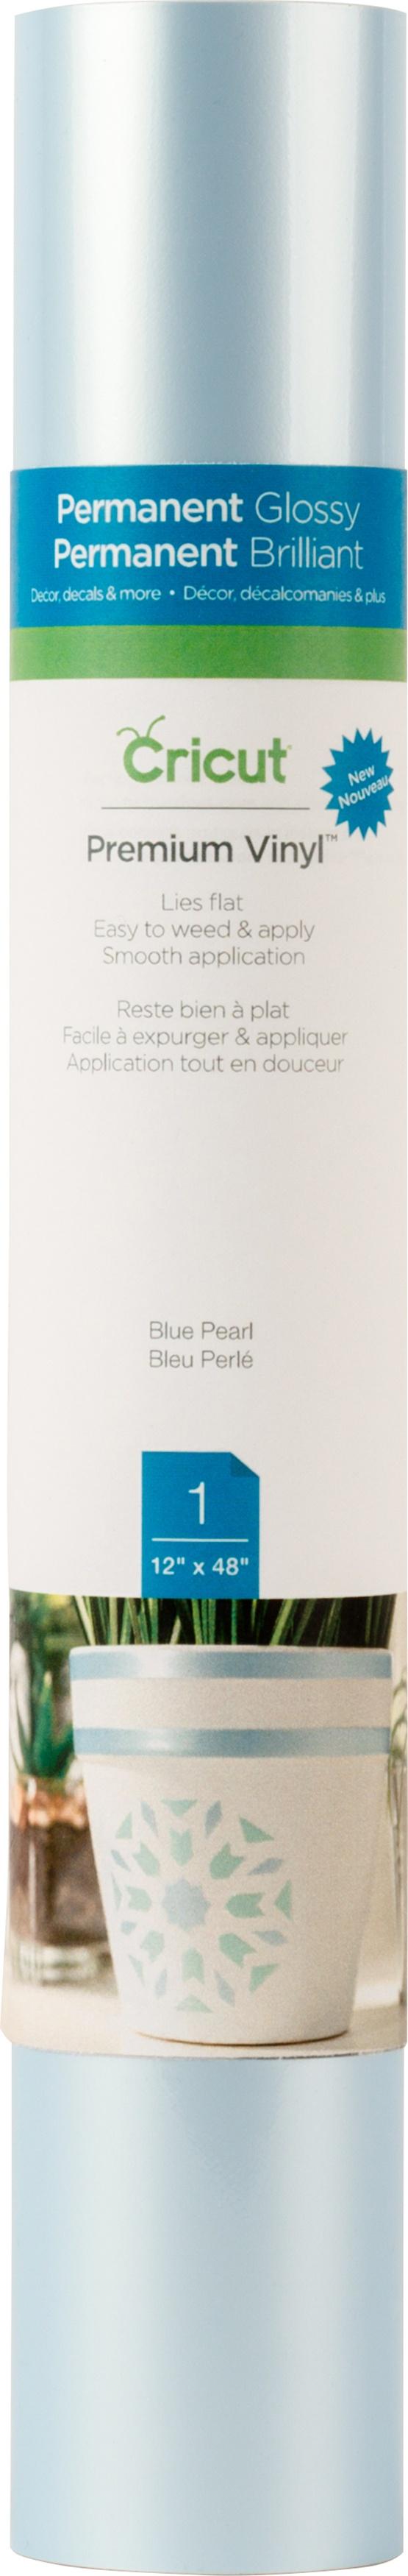 BLUE PEARL-CRICUT VINYL 12X48